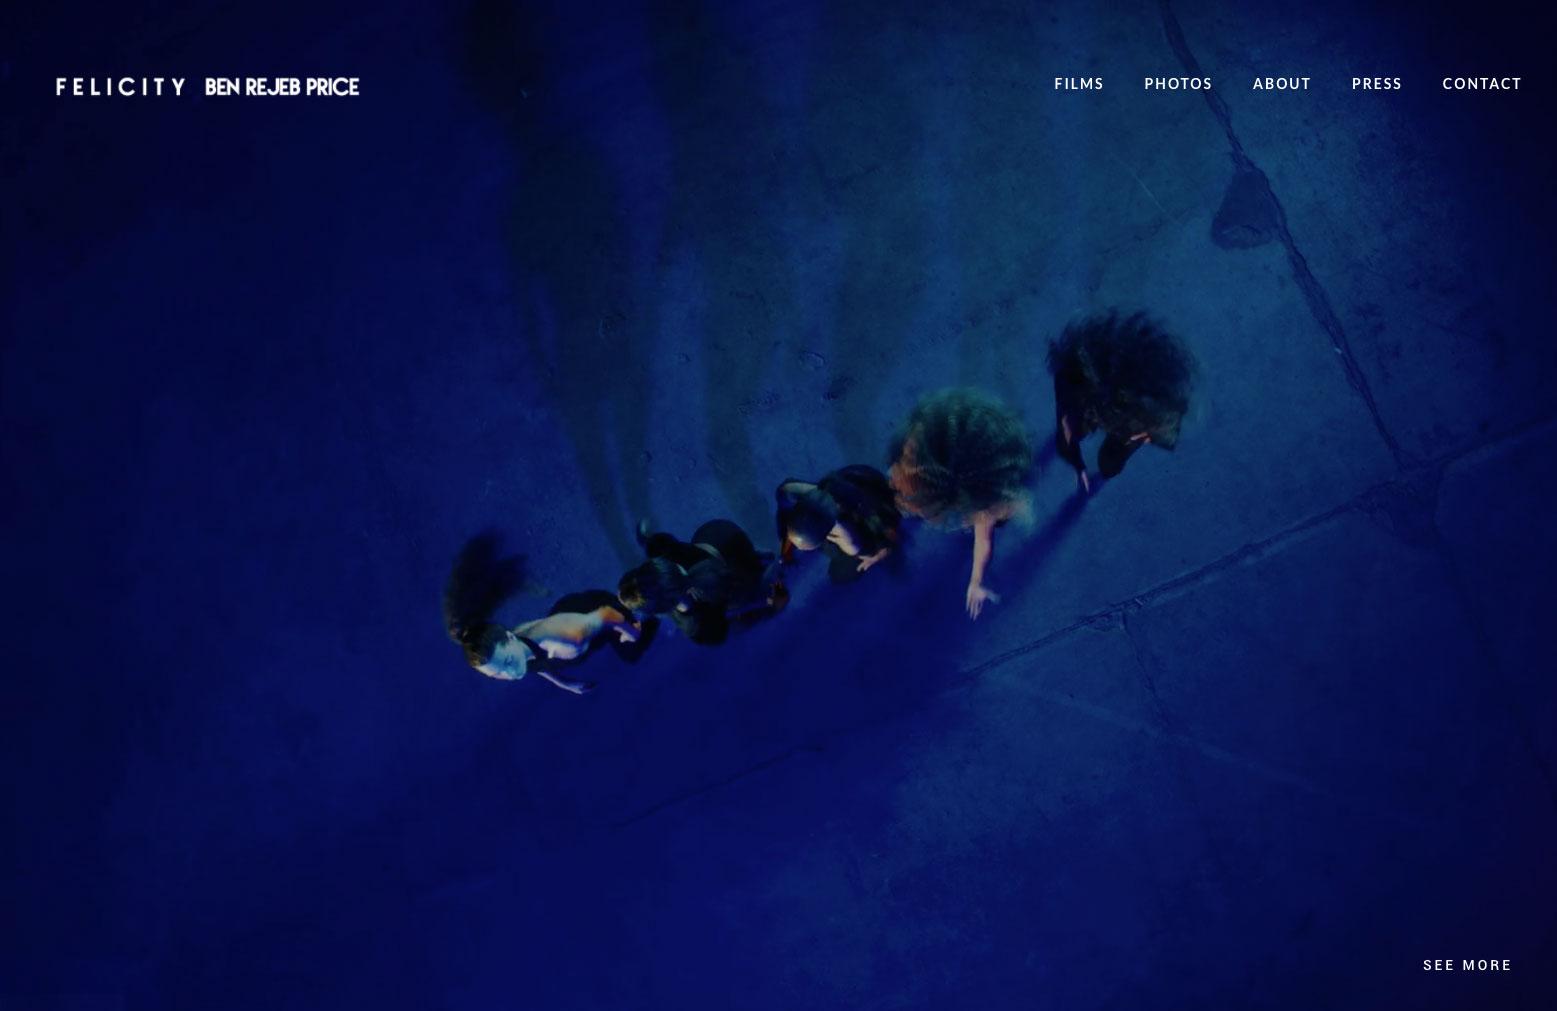 felicity-ben-rejeb-price-realisatrice-photographe-clips-rap-francais-landing-page